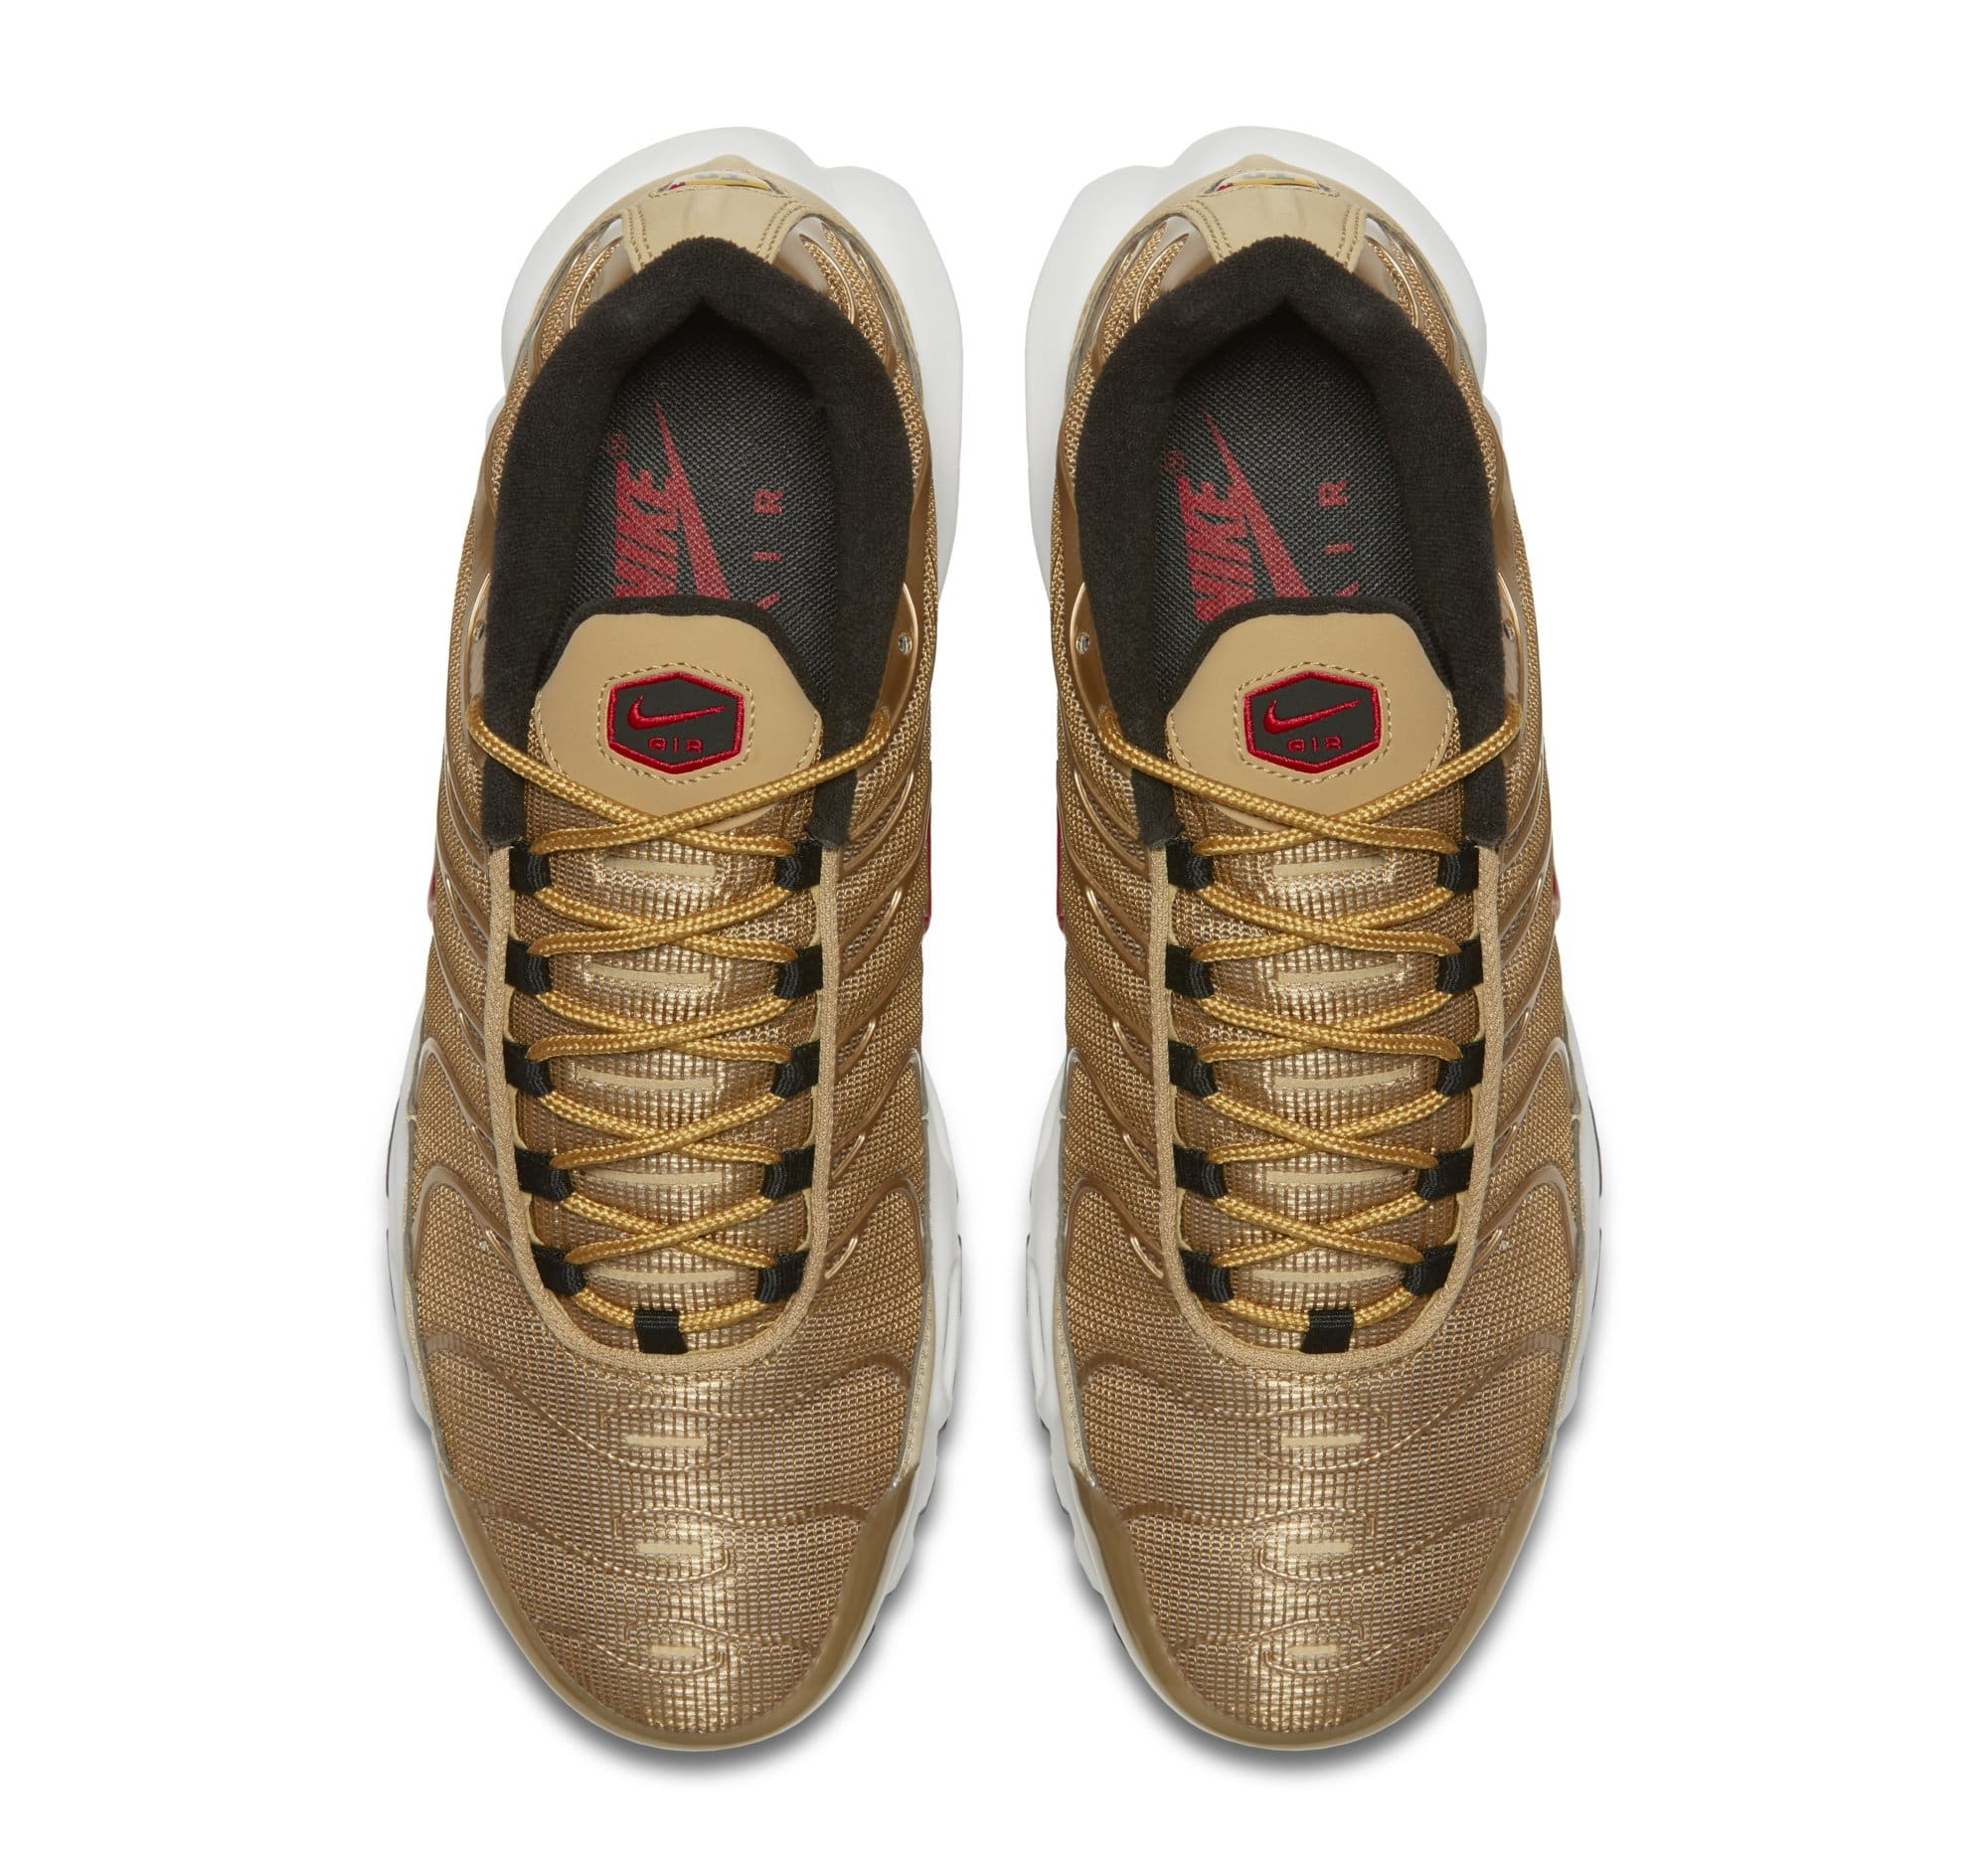 Nike Air Max Plus 'Metallic Gold' 903827-700 (Top)